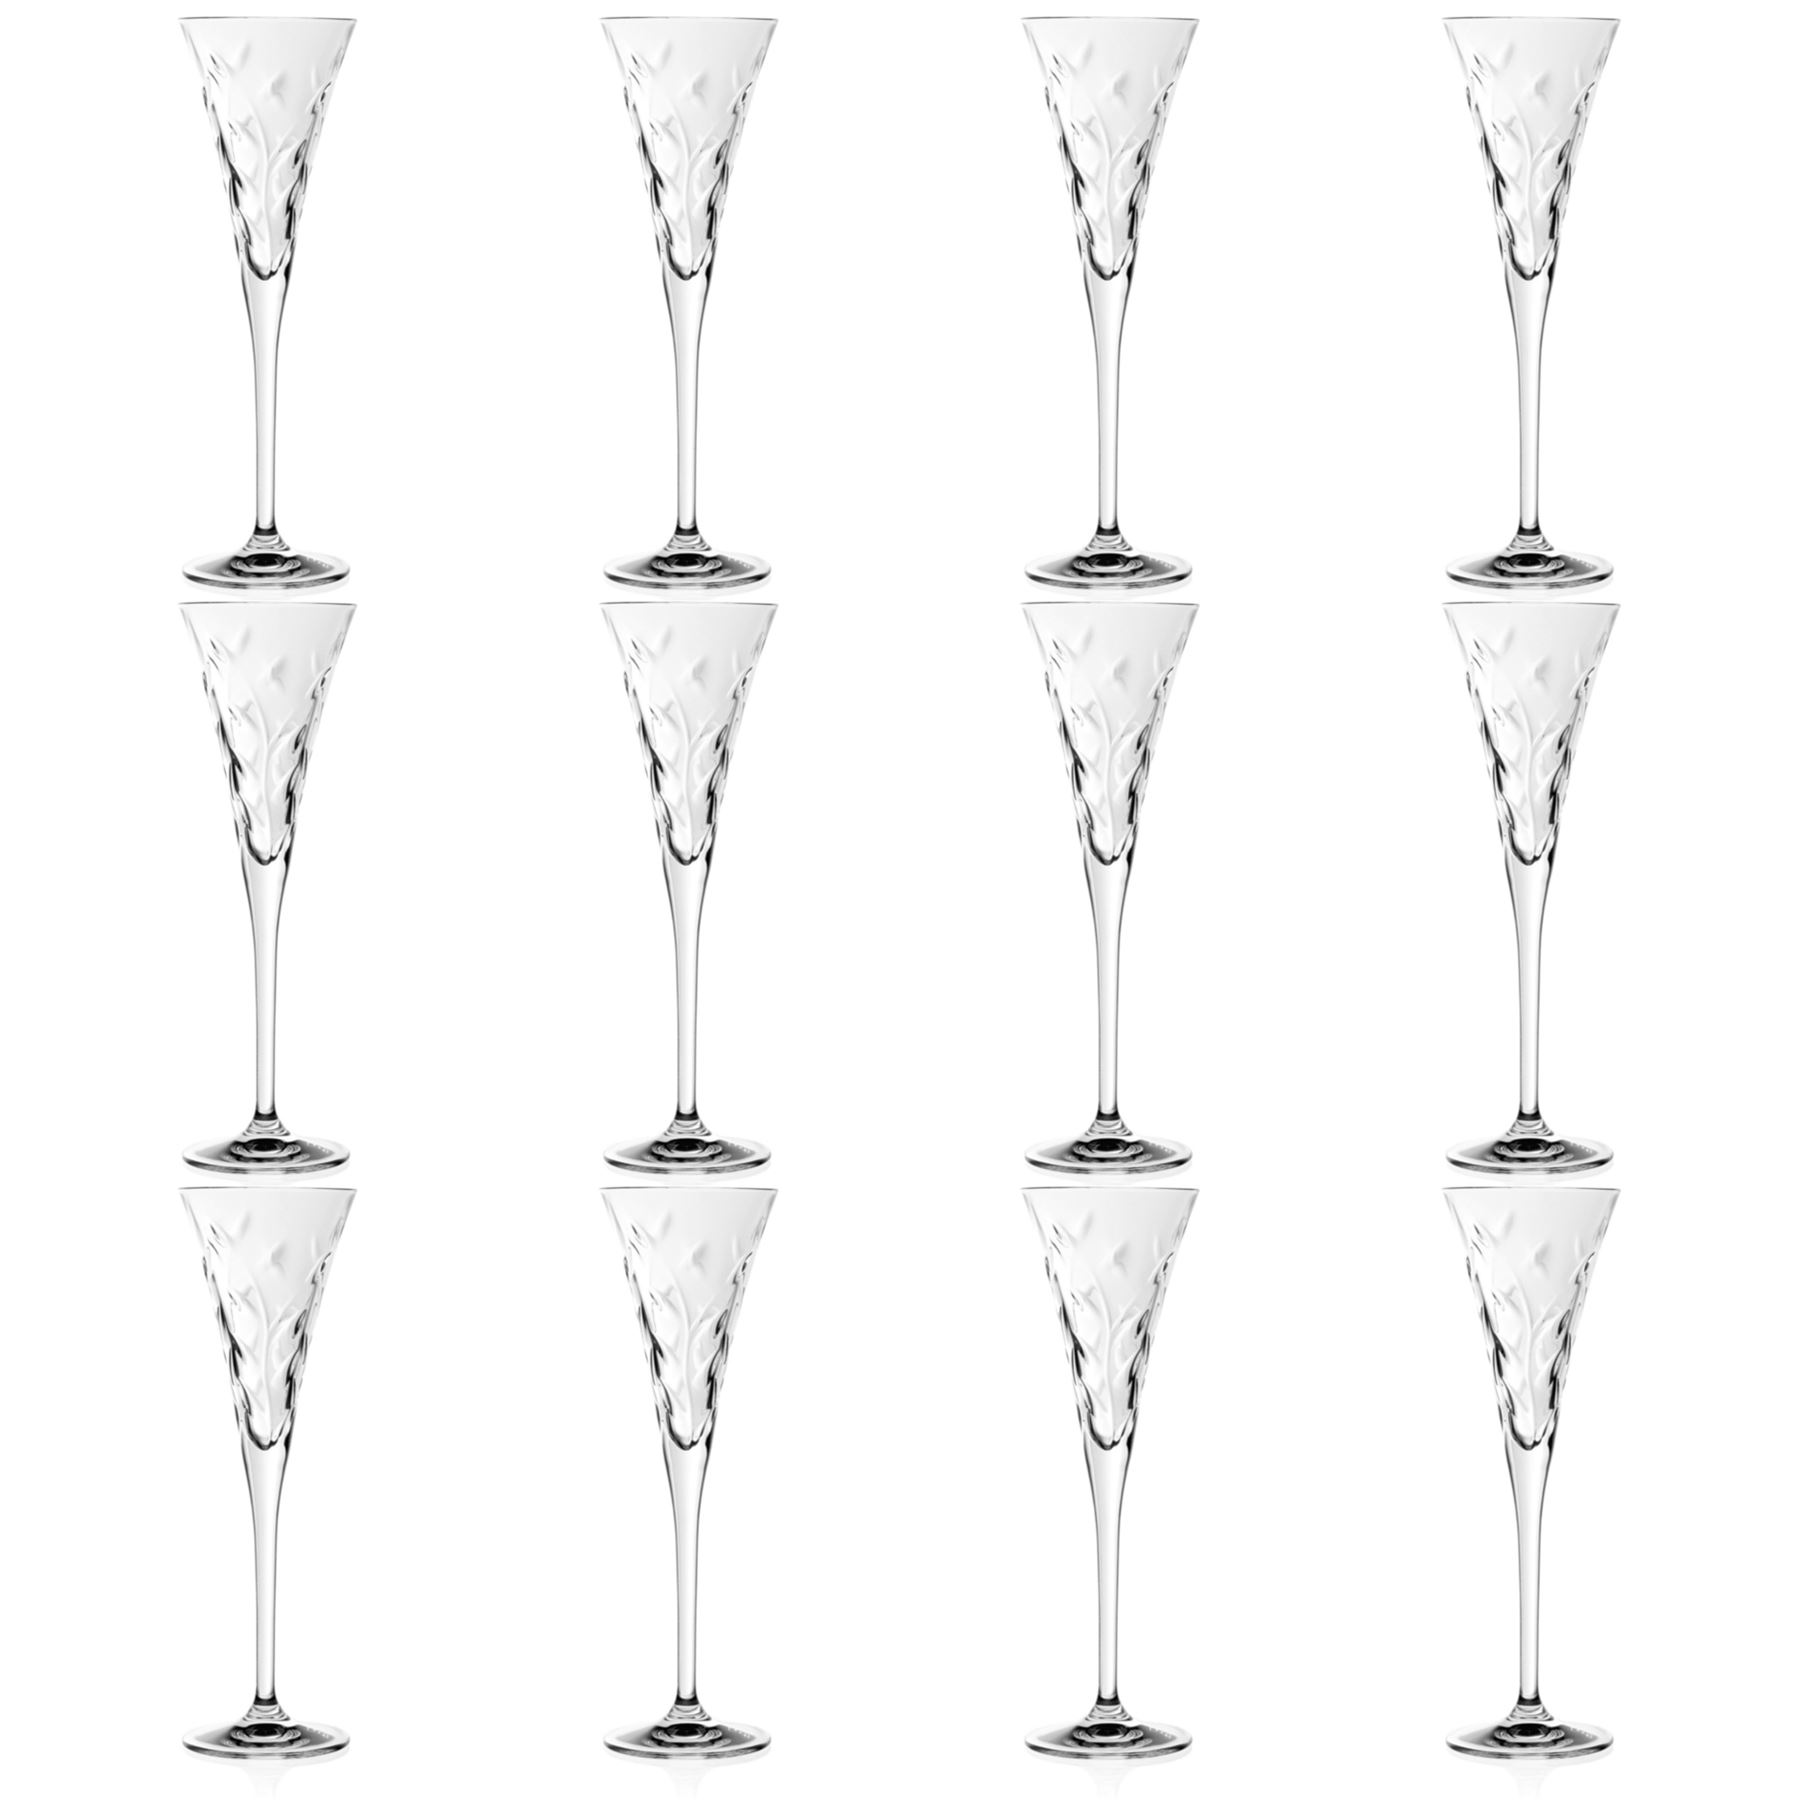 12x Laurus Cut Glas Champagner Floten